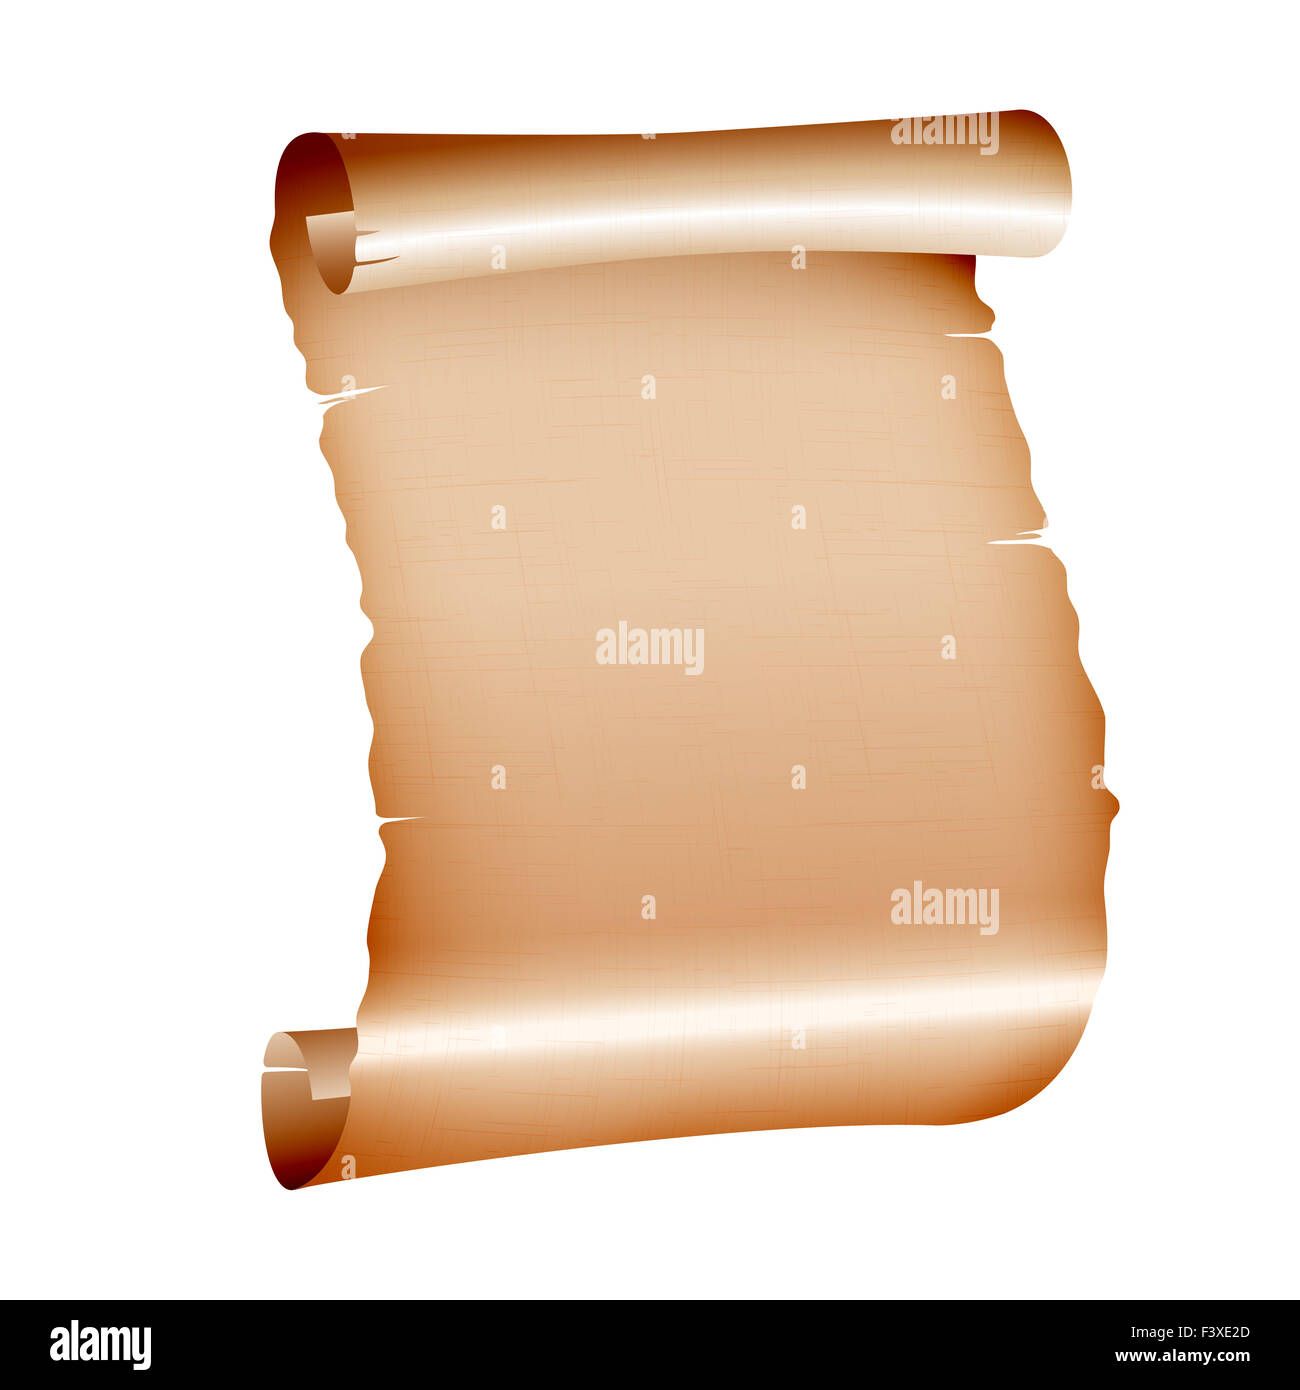 Old Scroll Stockfotos & Old Scroll Bilder - Seite 2 - Alamy